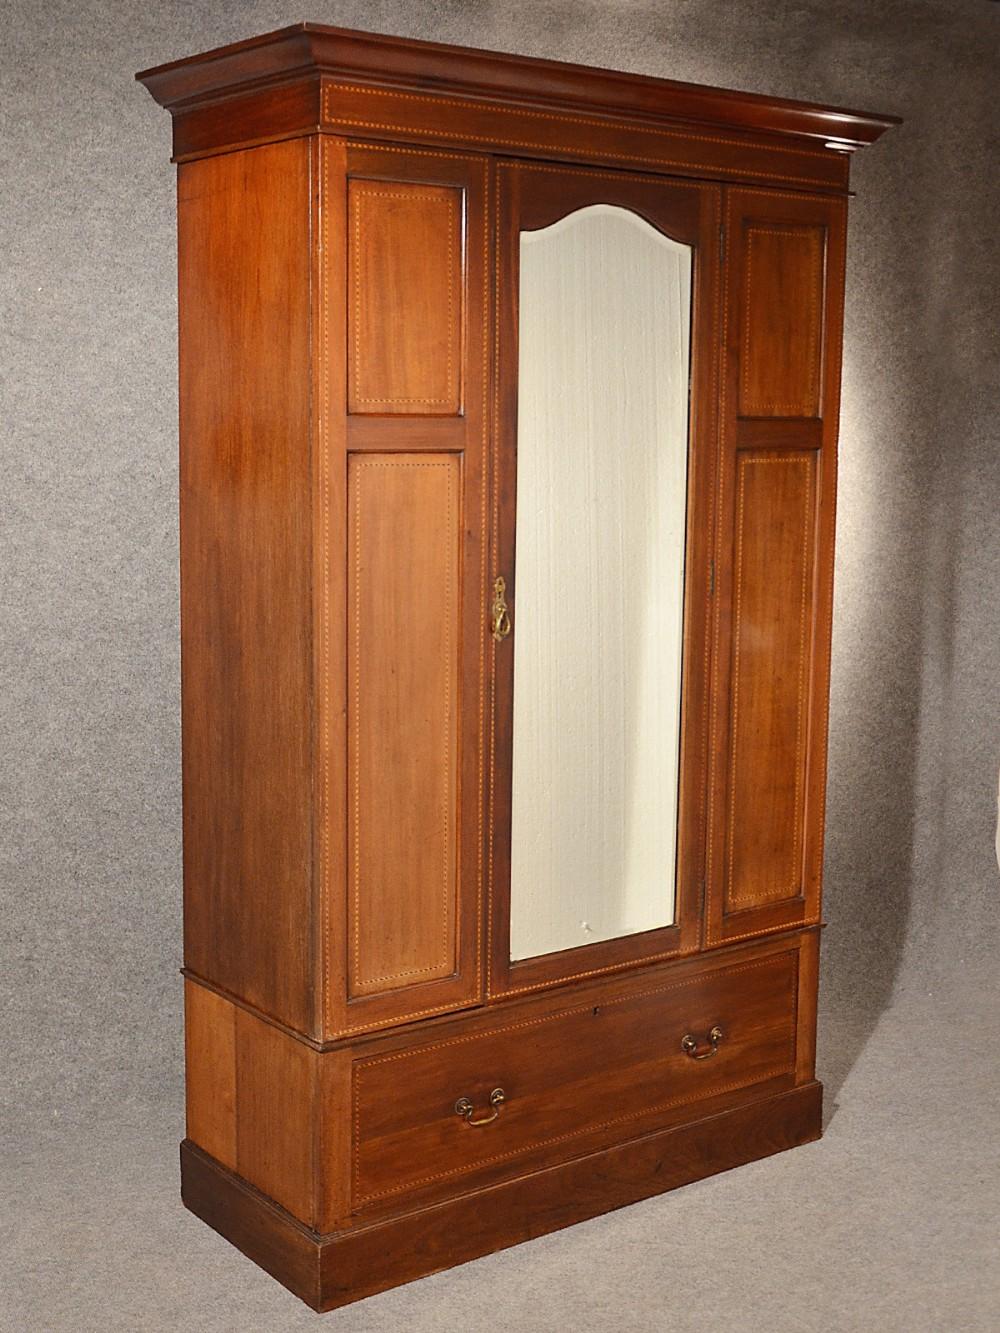 antique wardrobe with mirror Antique Wardrobe Armoire Mirror Door Maple & Co Quality English  antique wardrobe with mirror